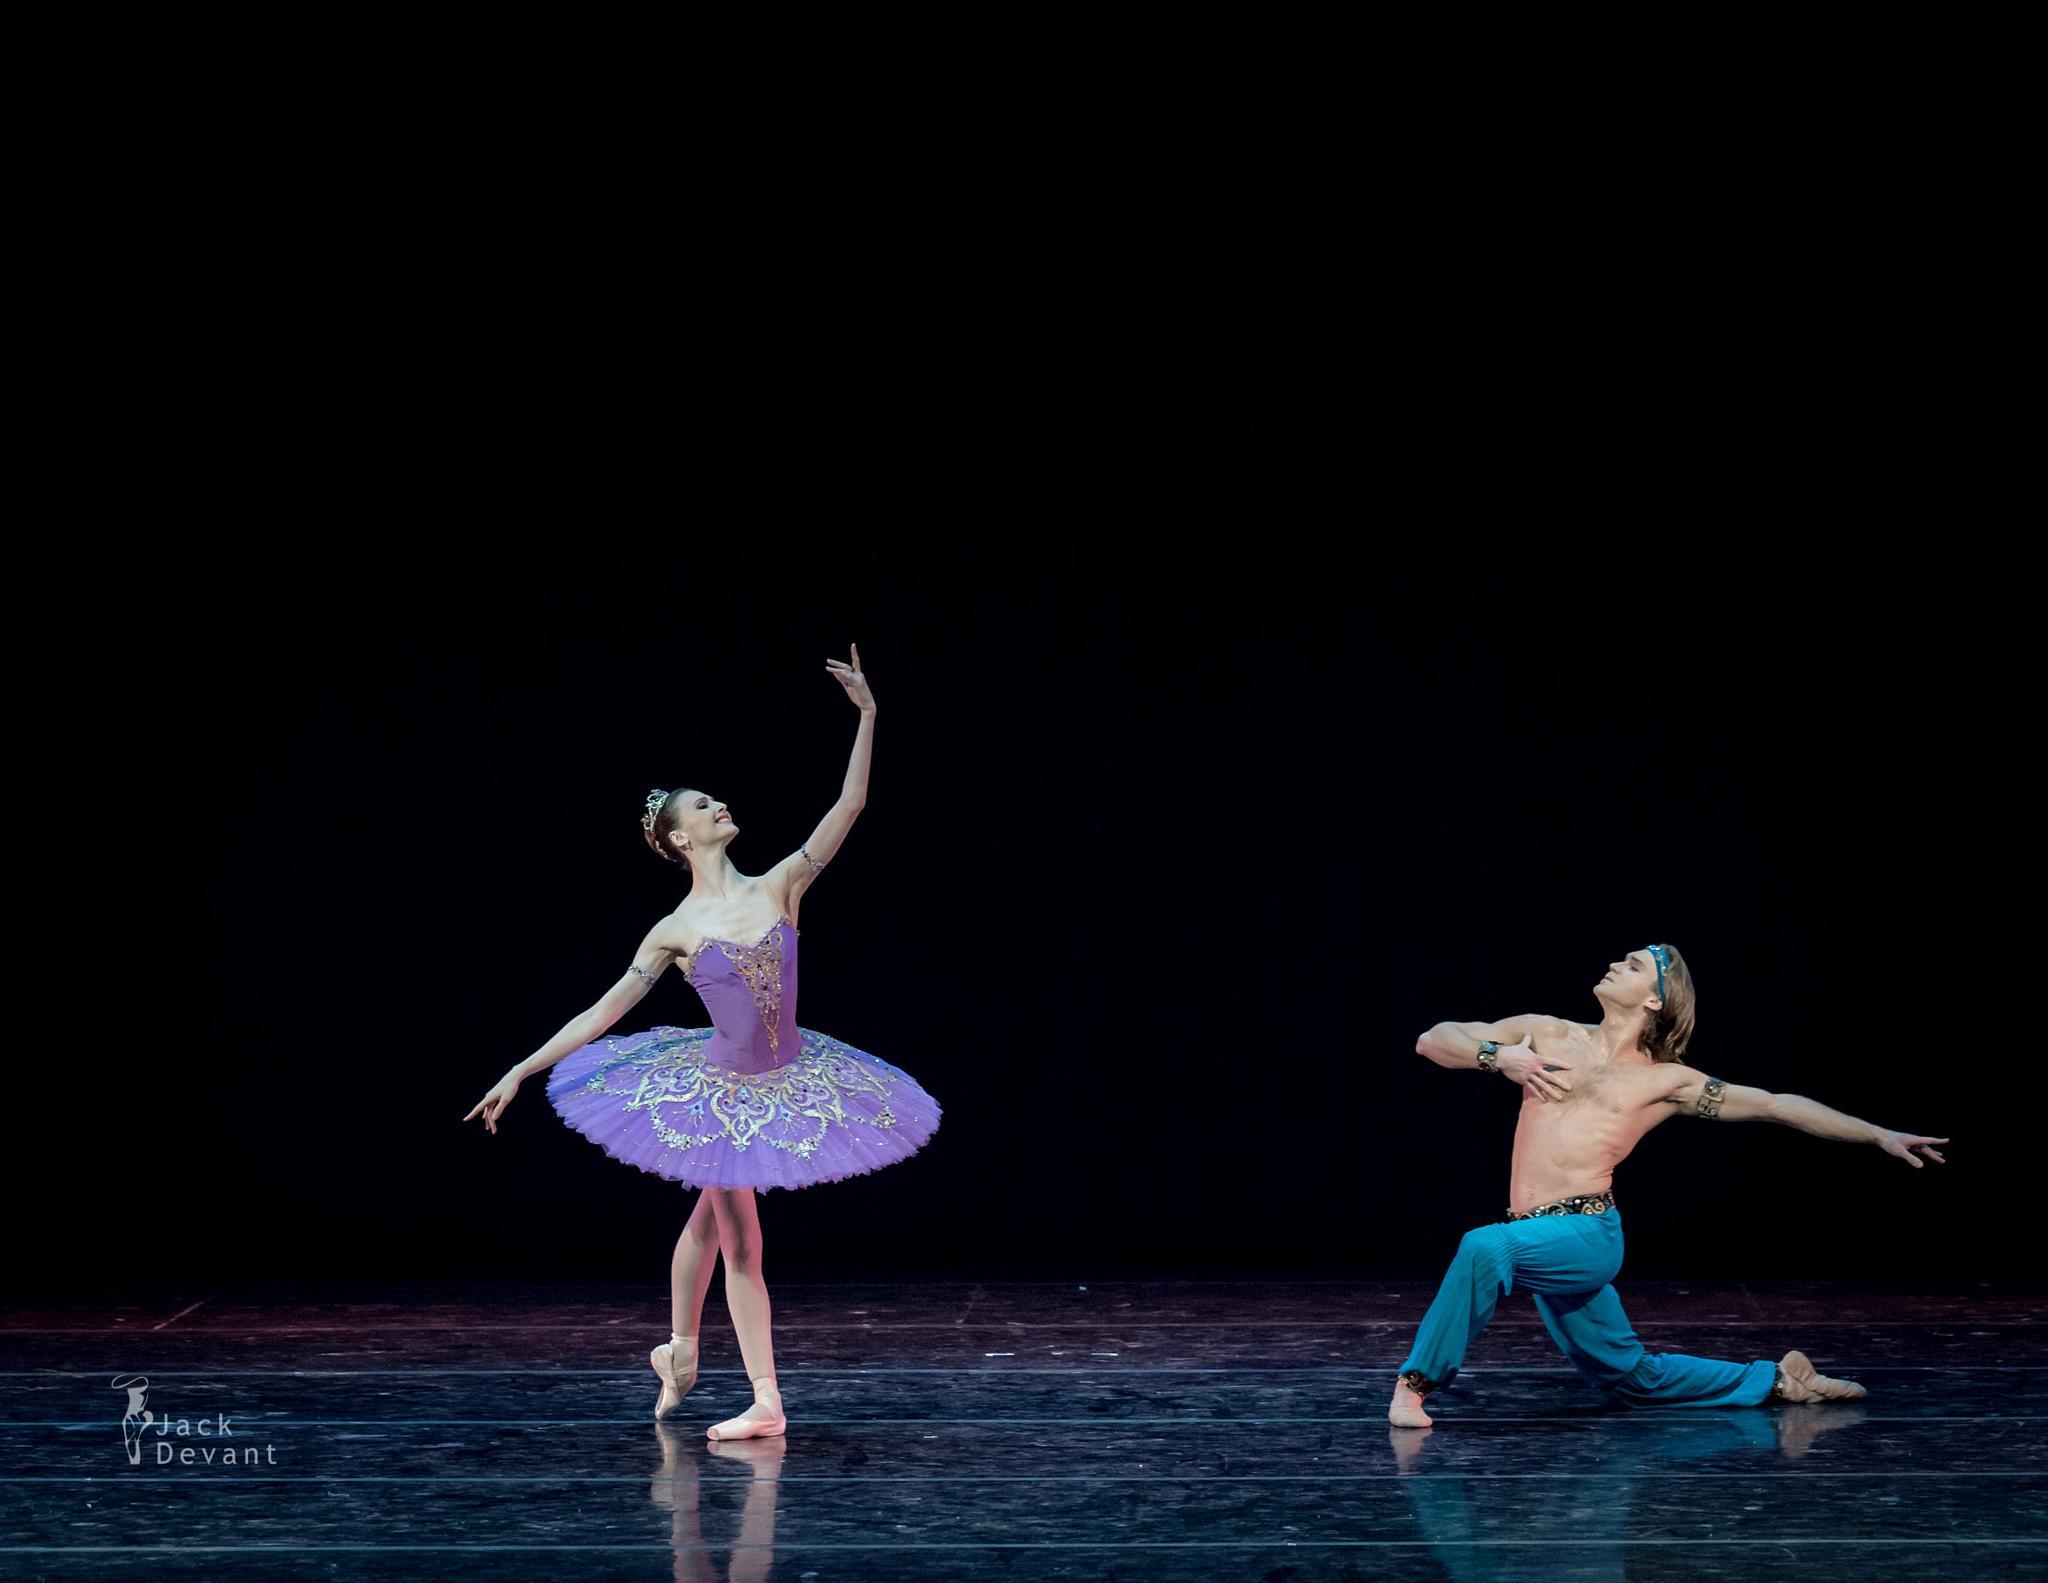 Svetlana Zakharova and Mikhail Lobukhin in Le Corsaire by Jack Devant